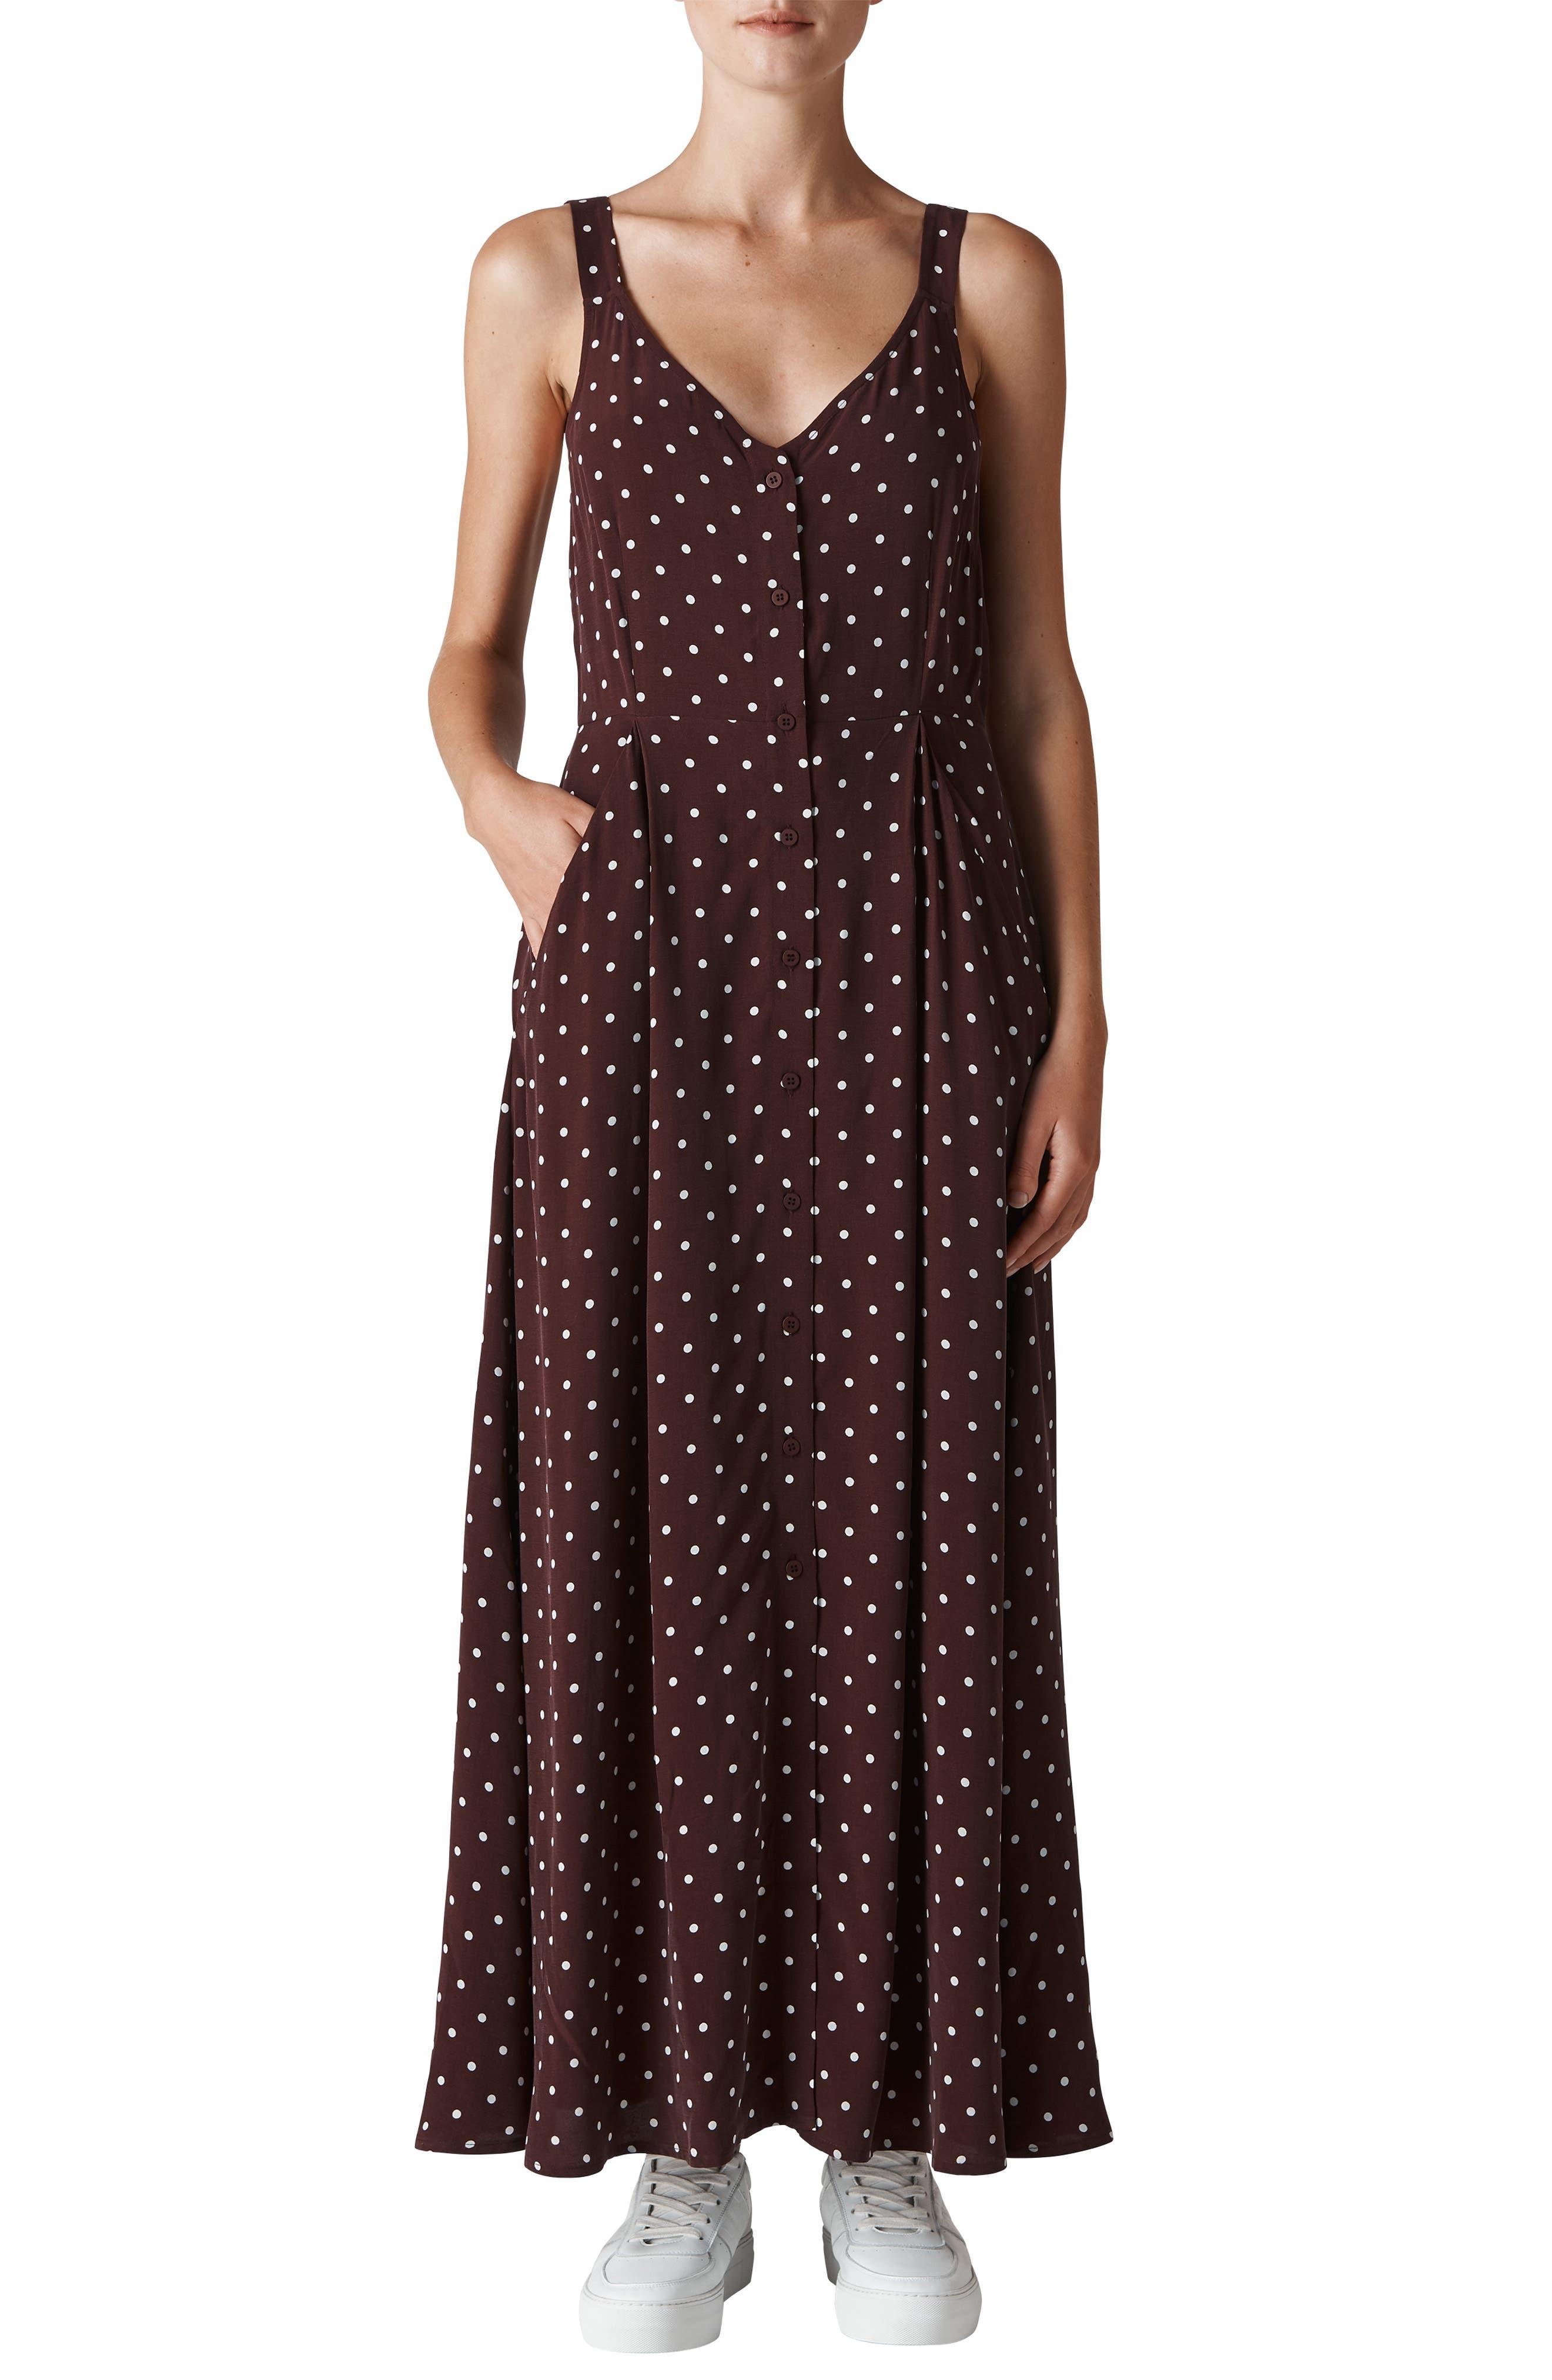 Spot Maxi Dress,                             Main thumbnail 1, color,                             930